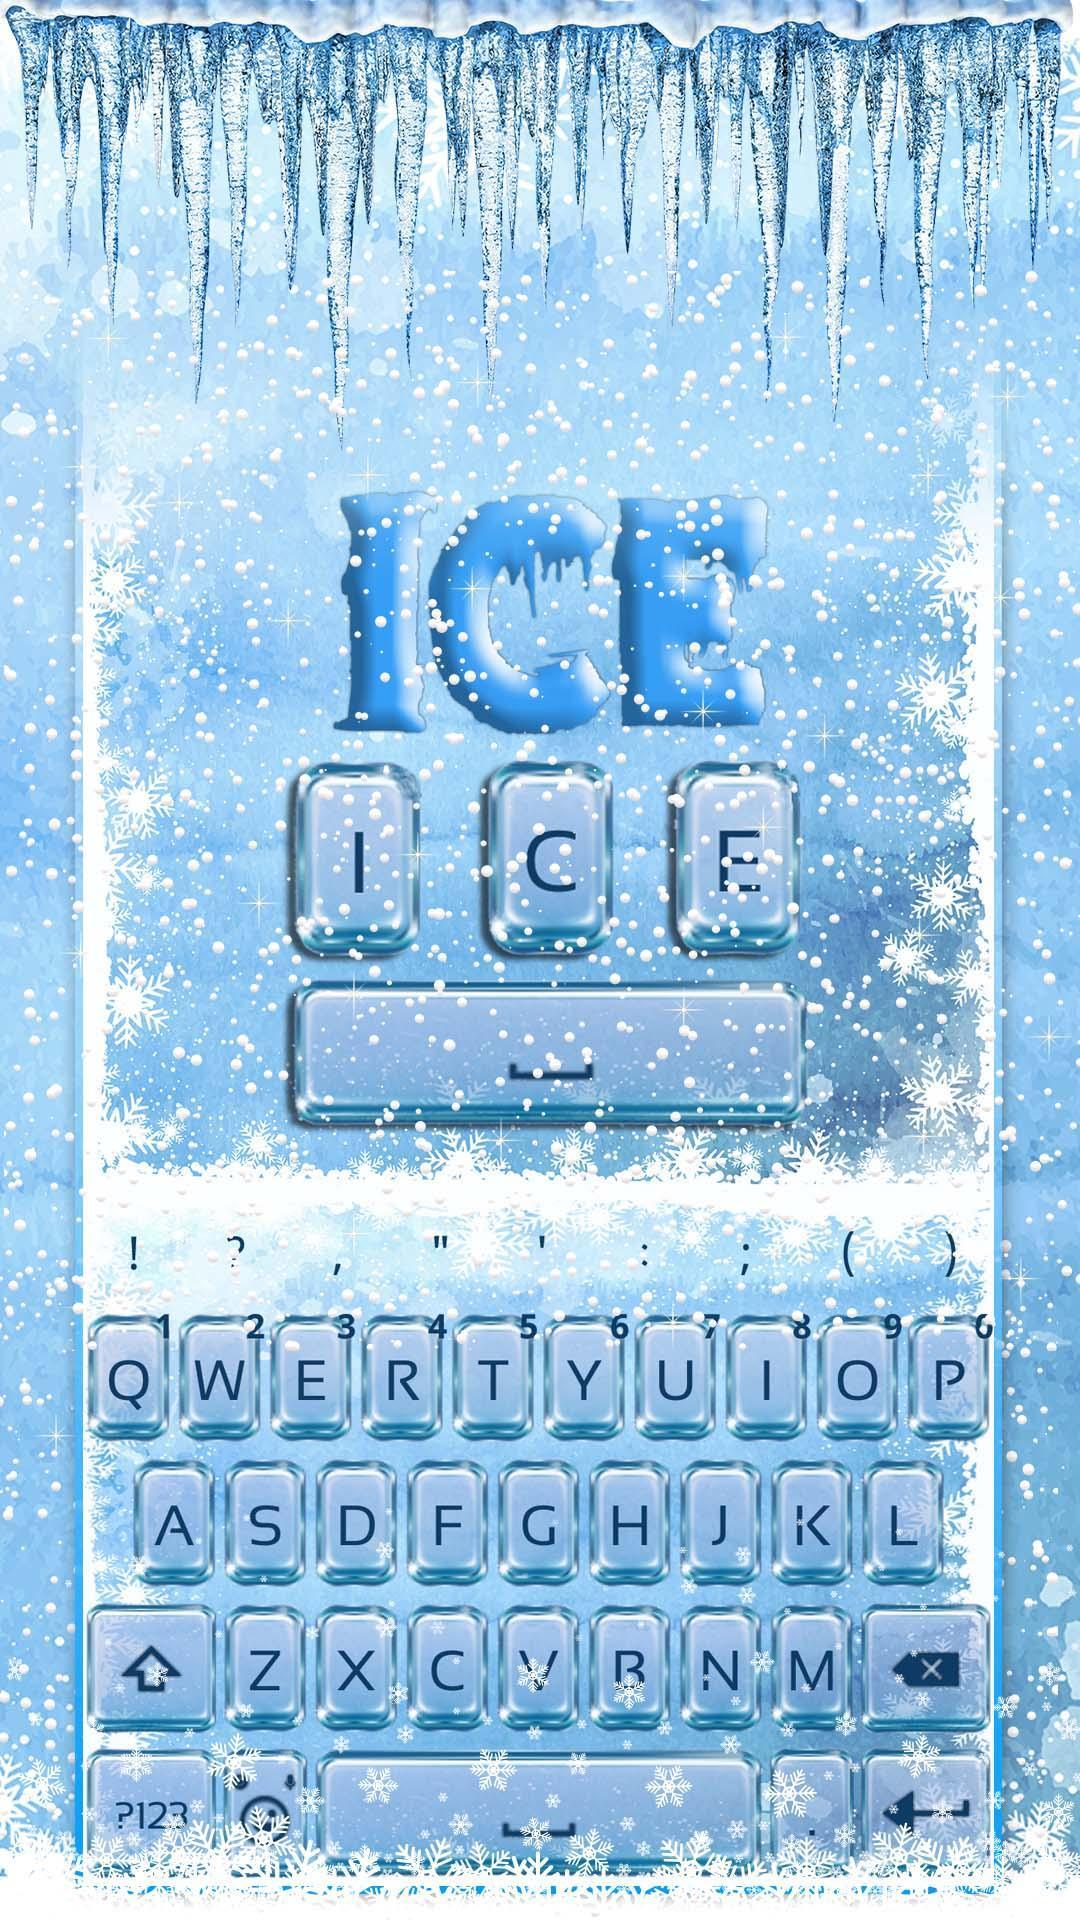 InstaEmoji Keyboard - Smart Emojis for Android - APK Download